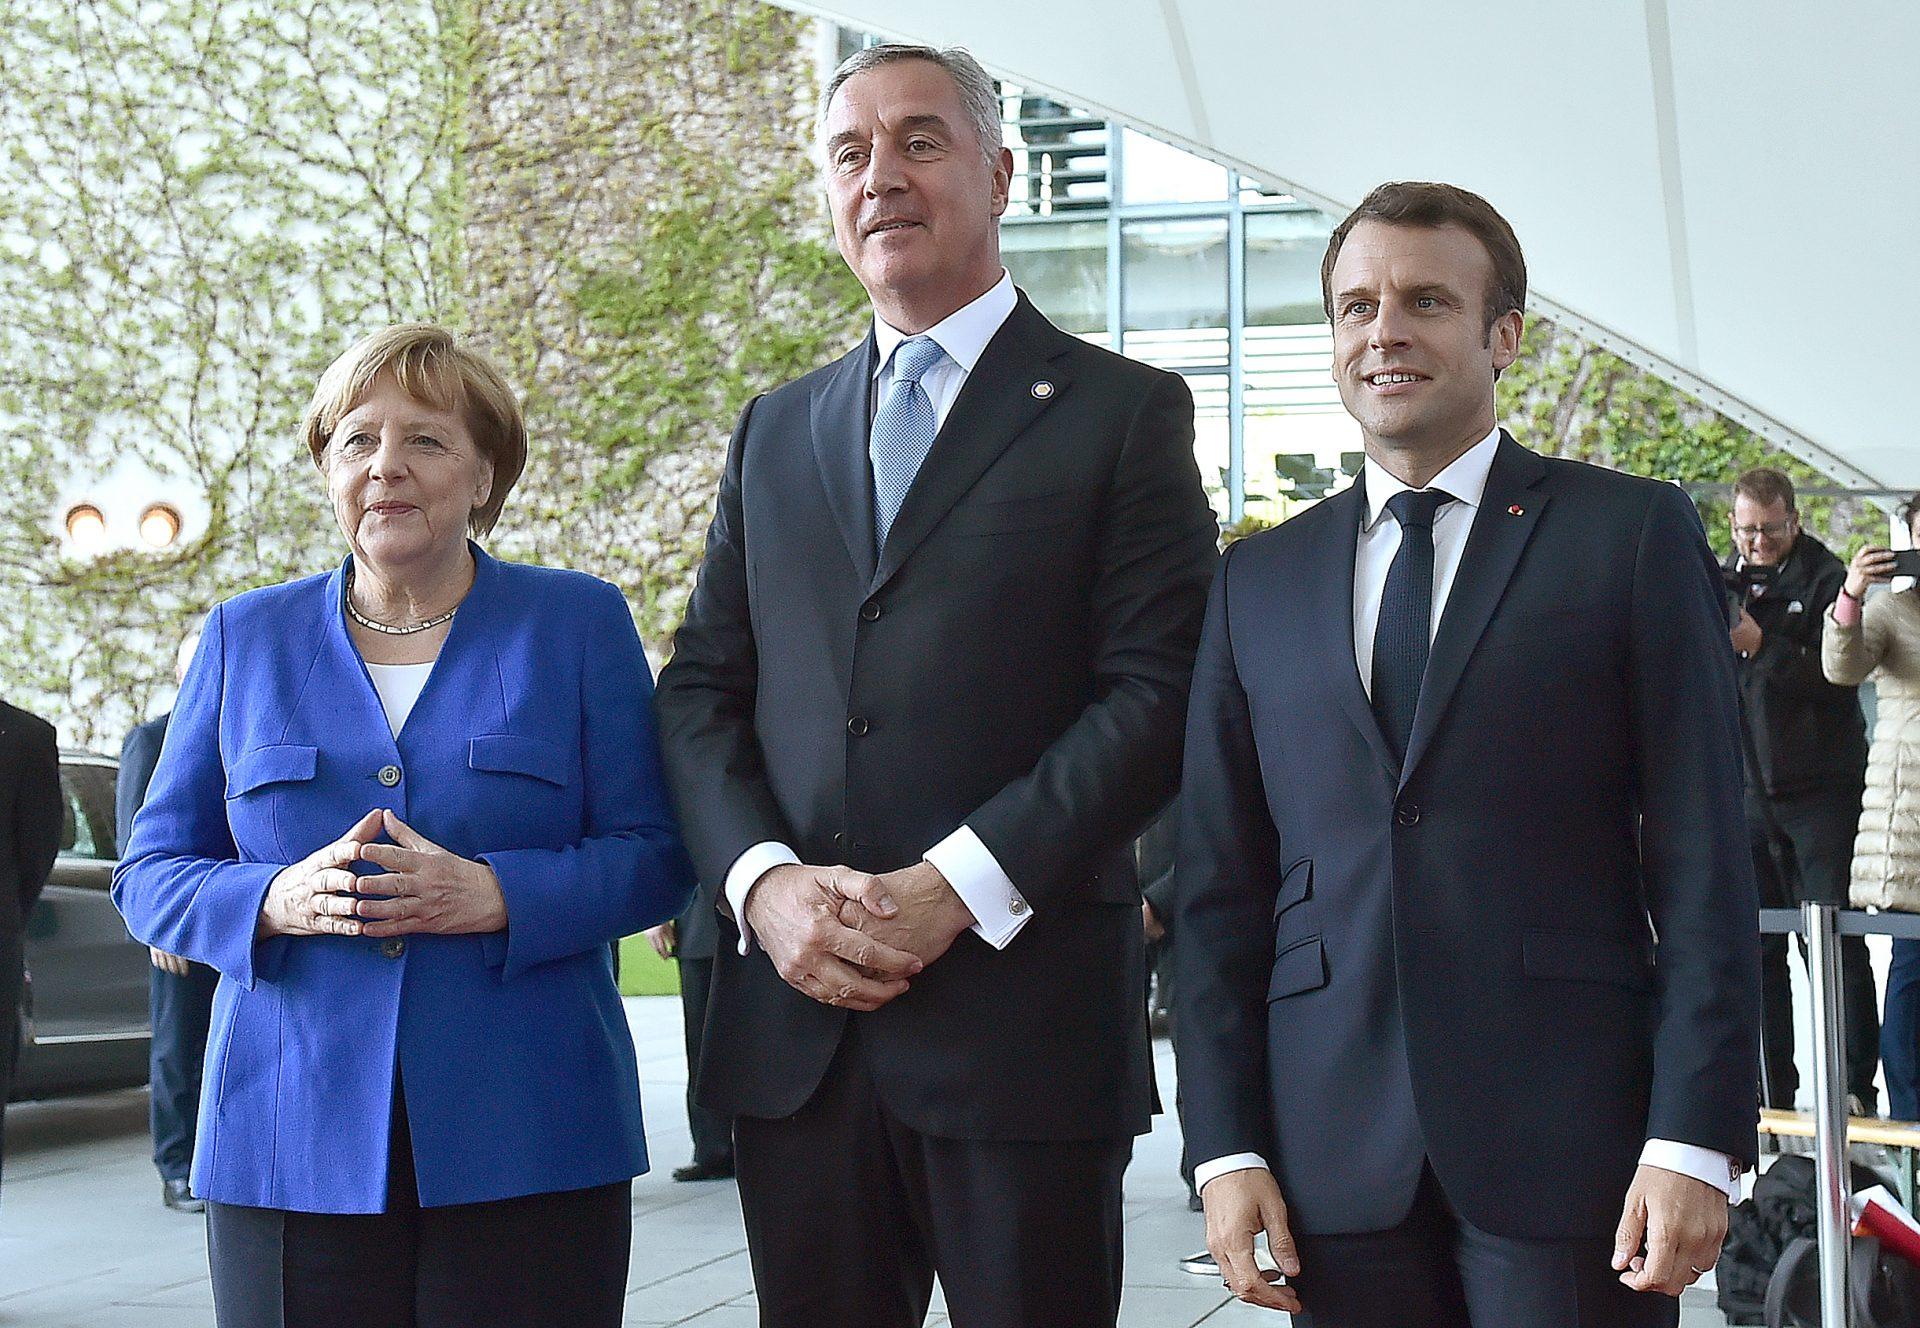 The Berlin summit was important for Serbia-Kosovo relations, says President Đukanović